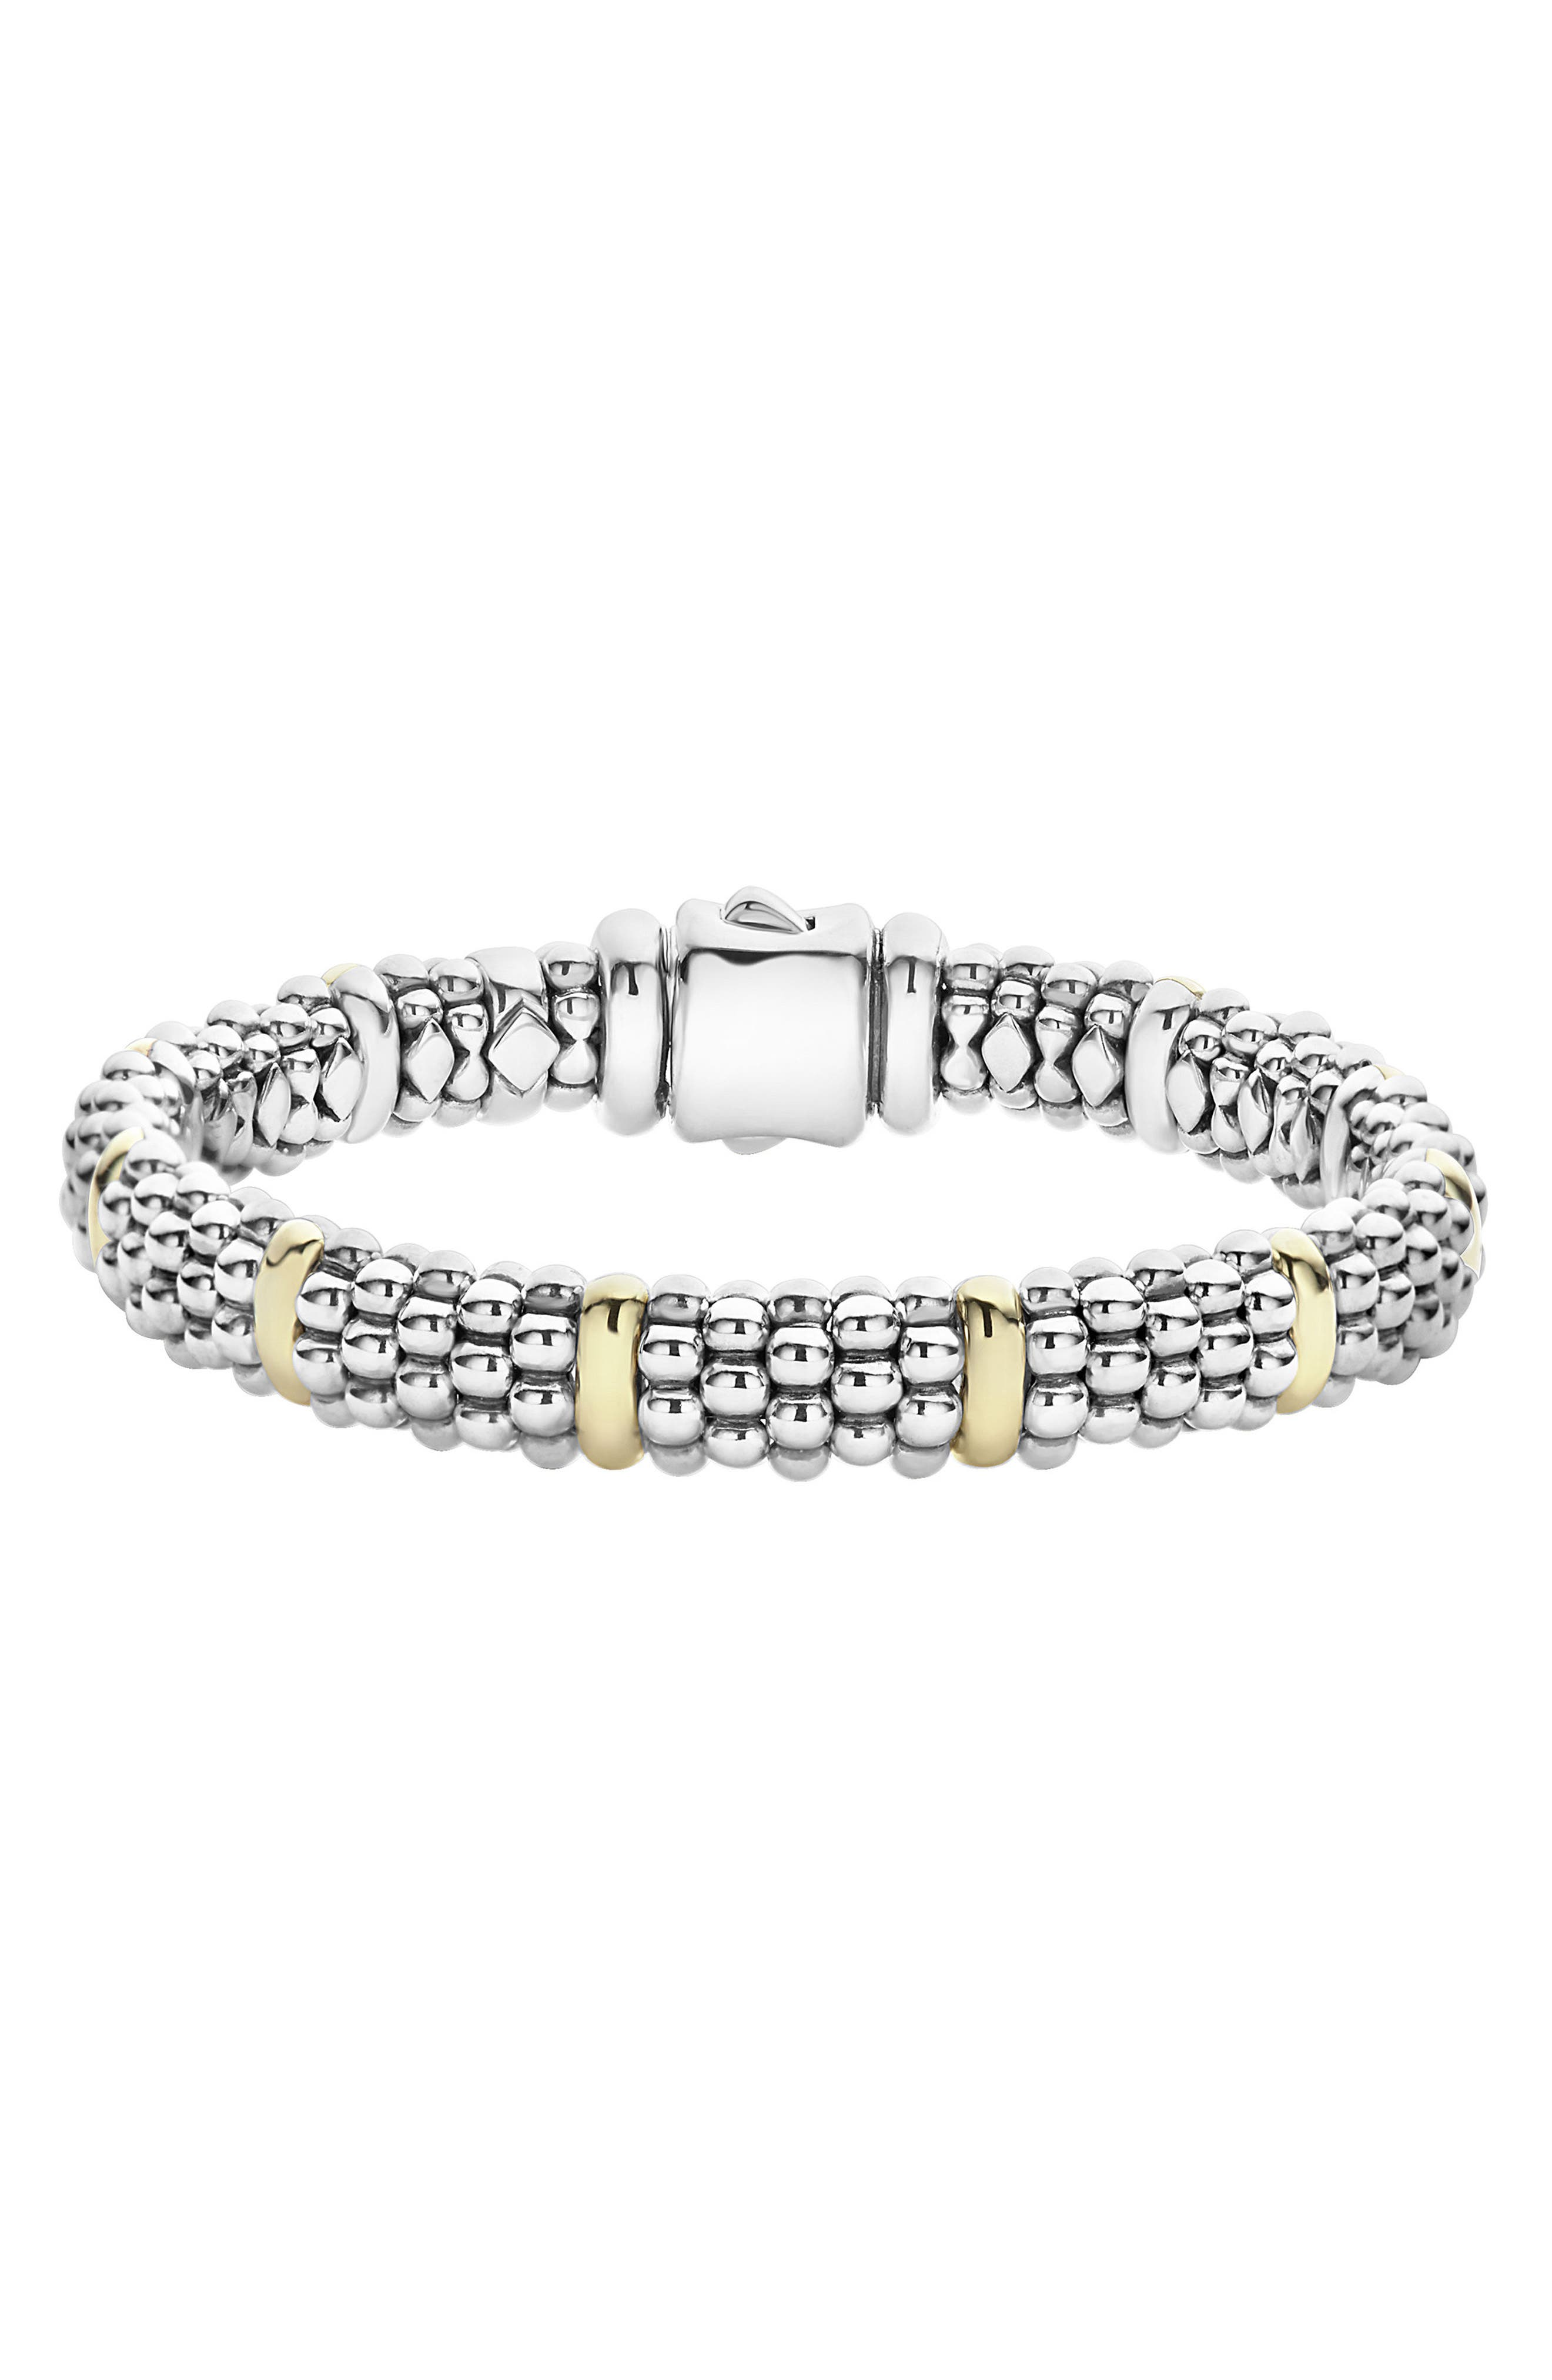 Oval Caviar Rope Bracelet,                         Main,                         color, SILVER/ GOLD